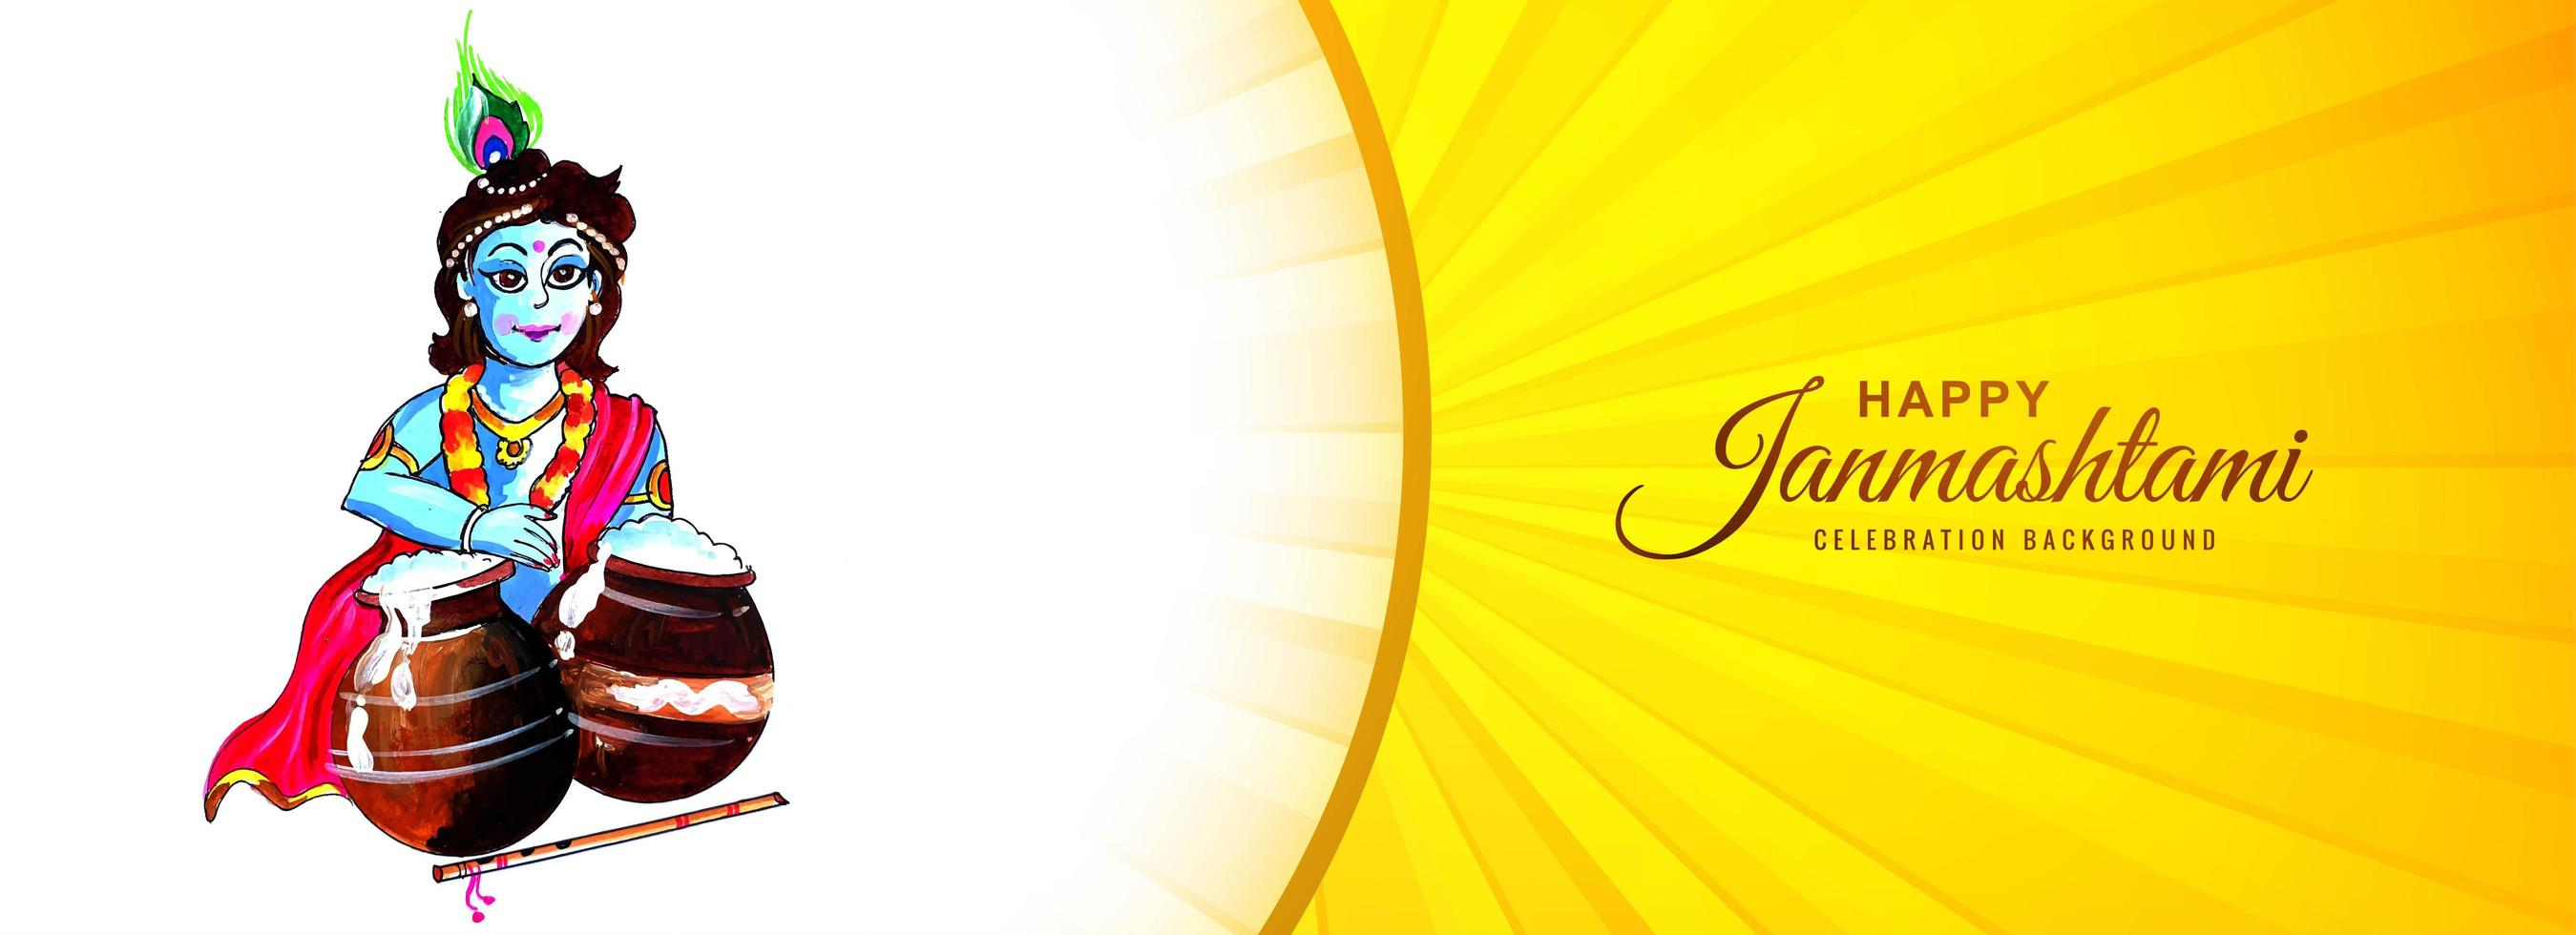 dahi handi krishna janmashtami banner amarillo sunburst vector